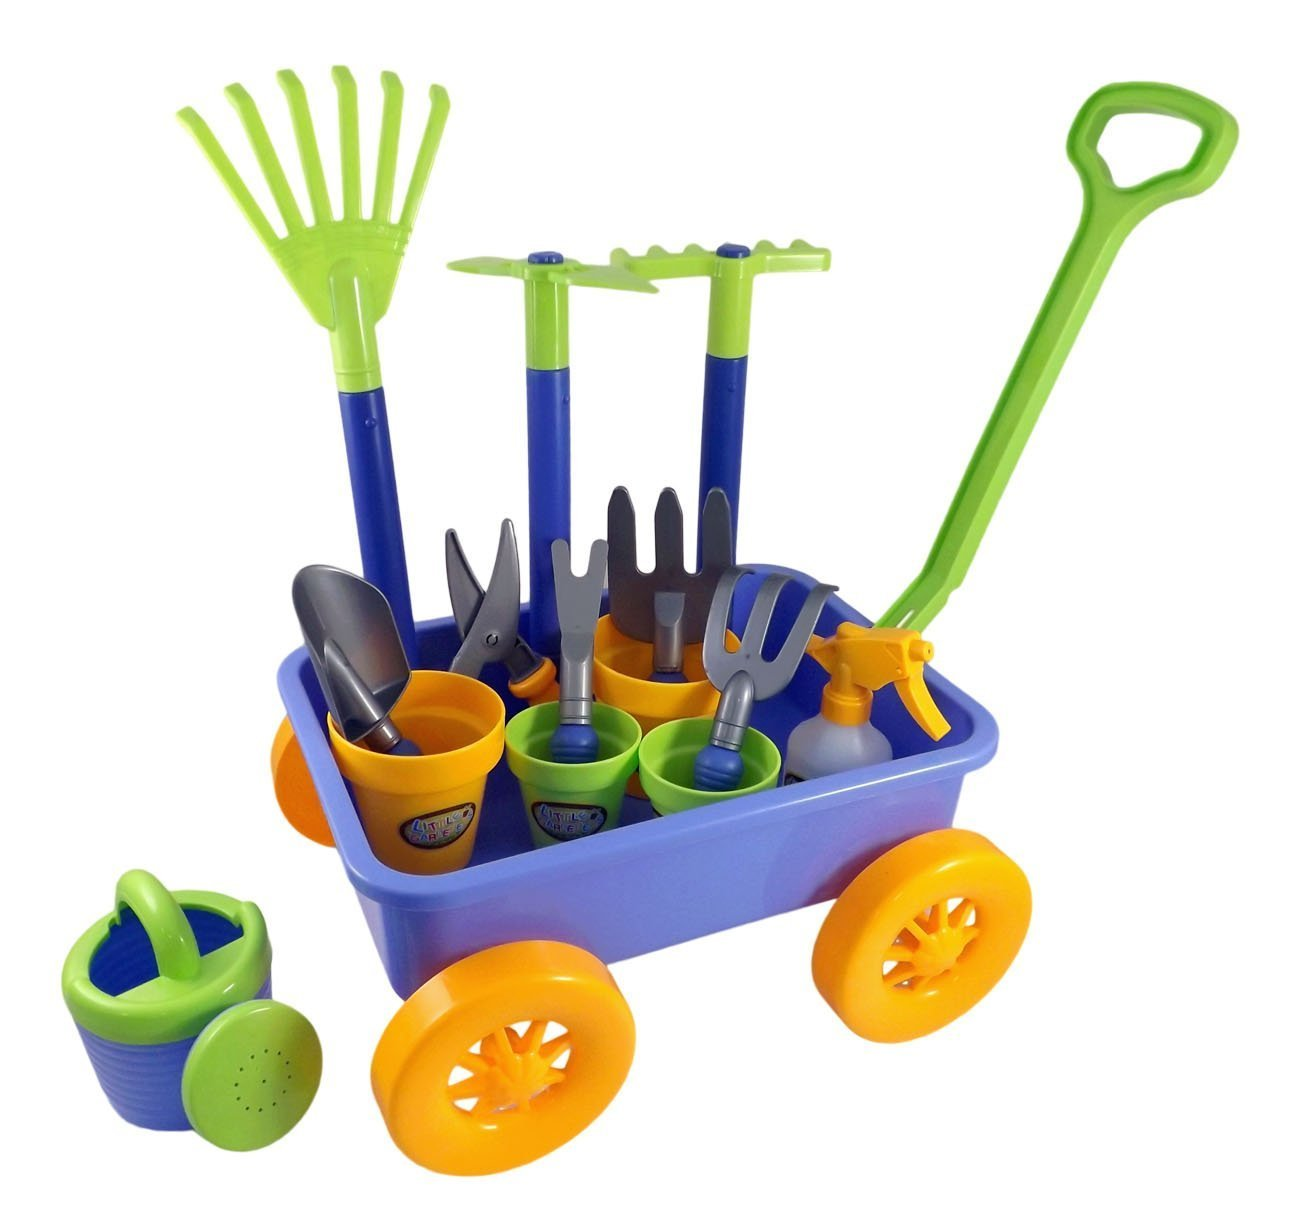 AMPERSAND SHOPS Kids Garden Wagon & Tools Play Set